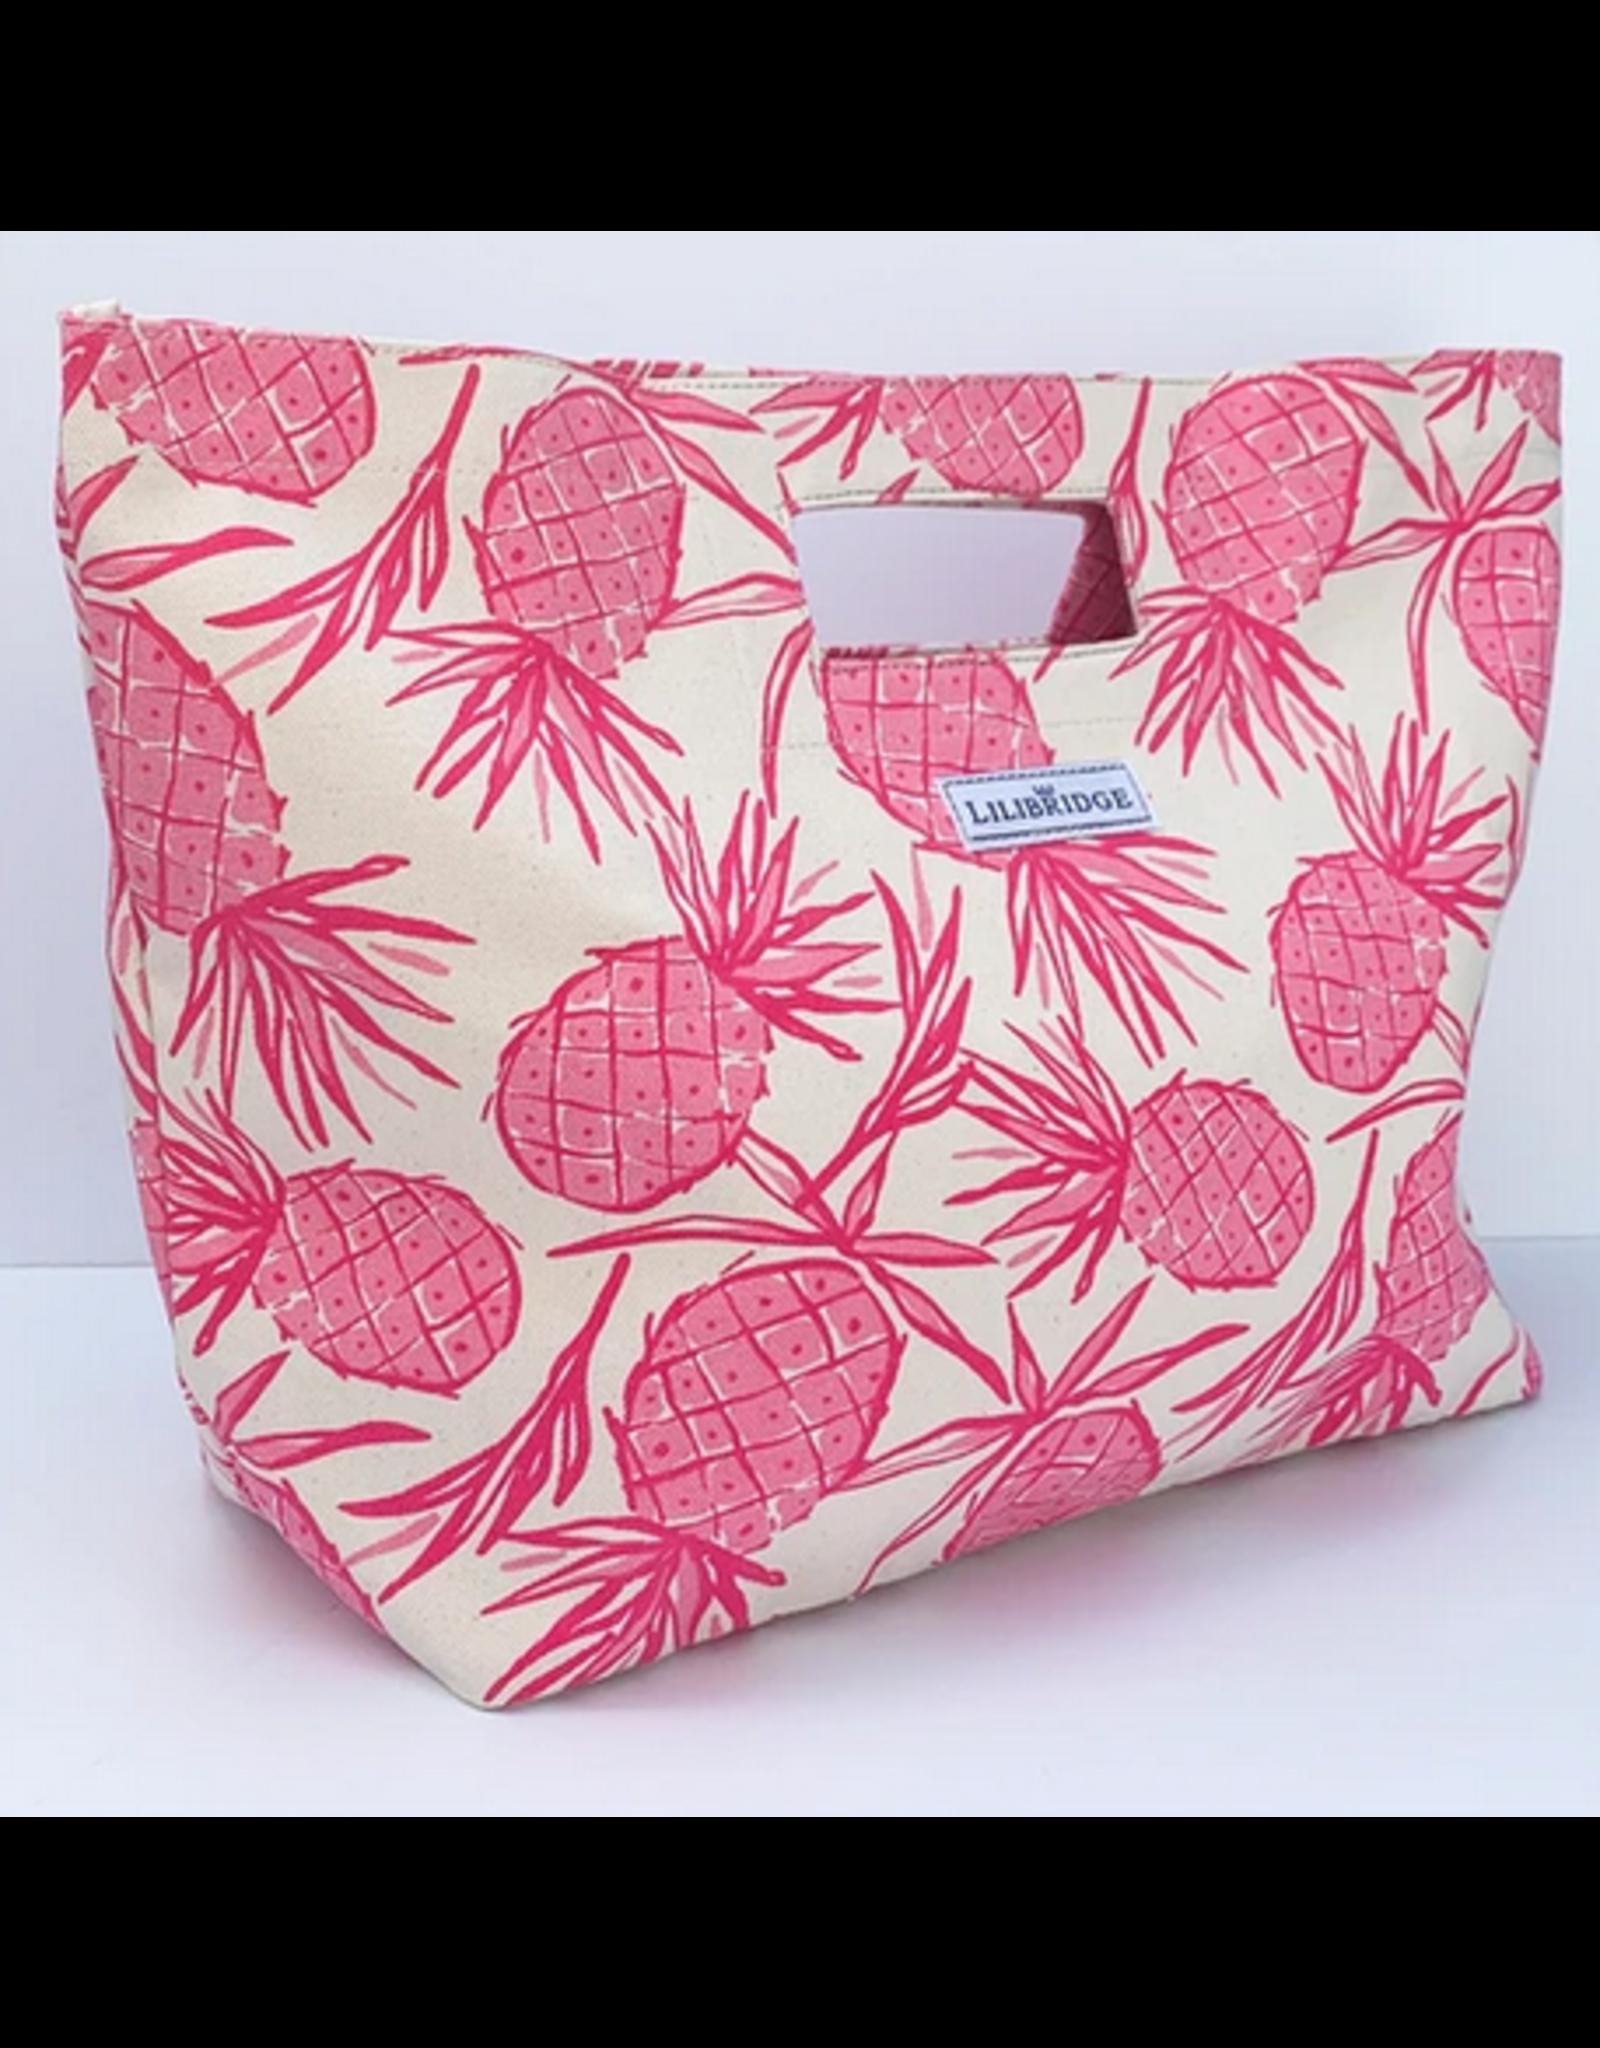 Lilibridge Pink Pineapple Bag by Lilibridge